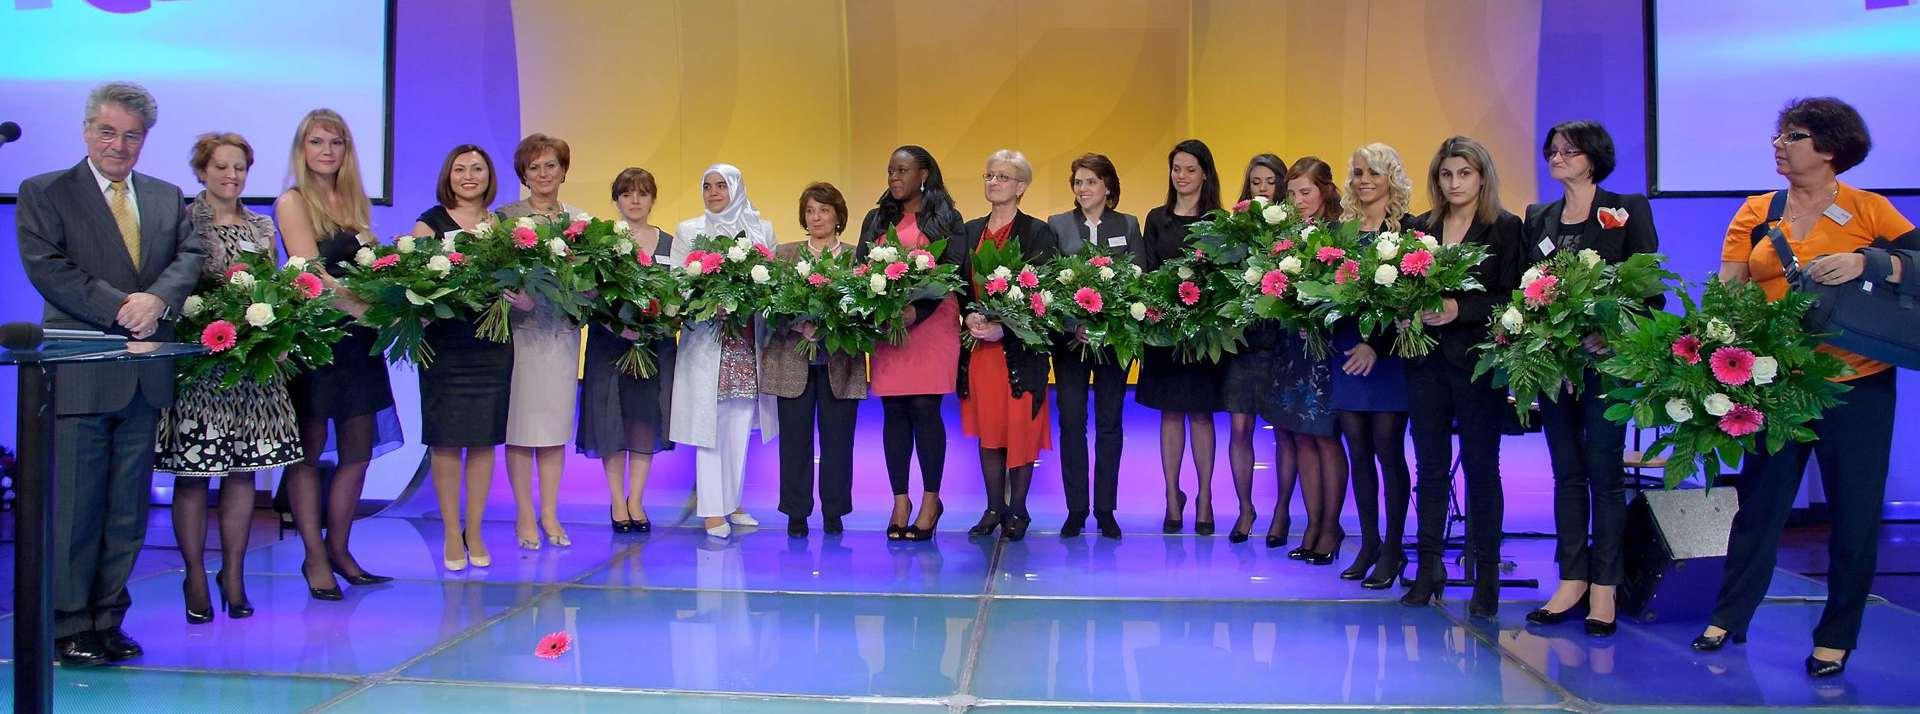 MiA Awards 2012 vergeben